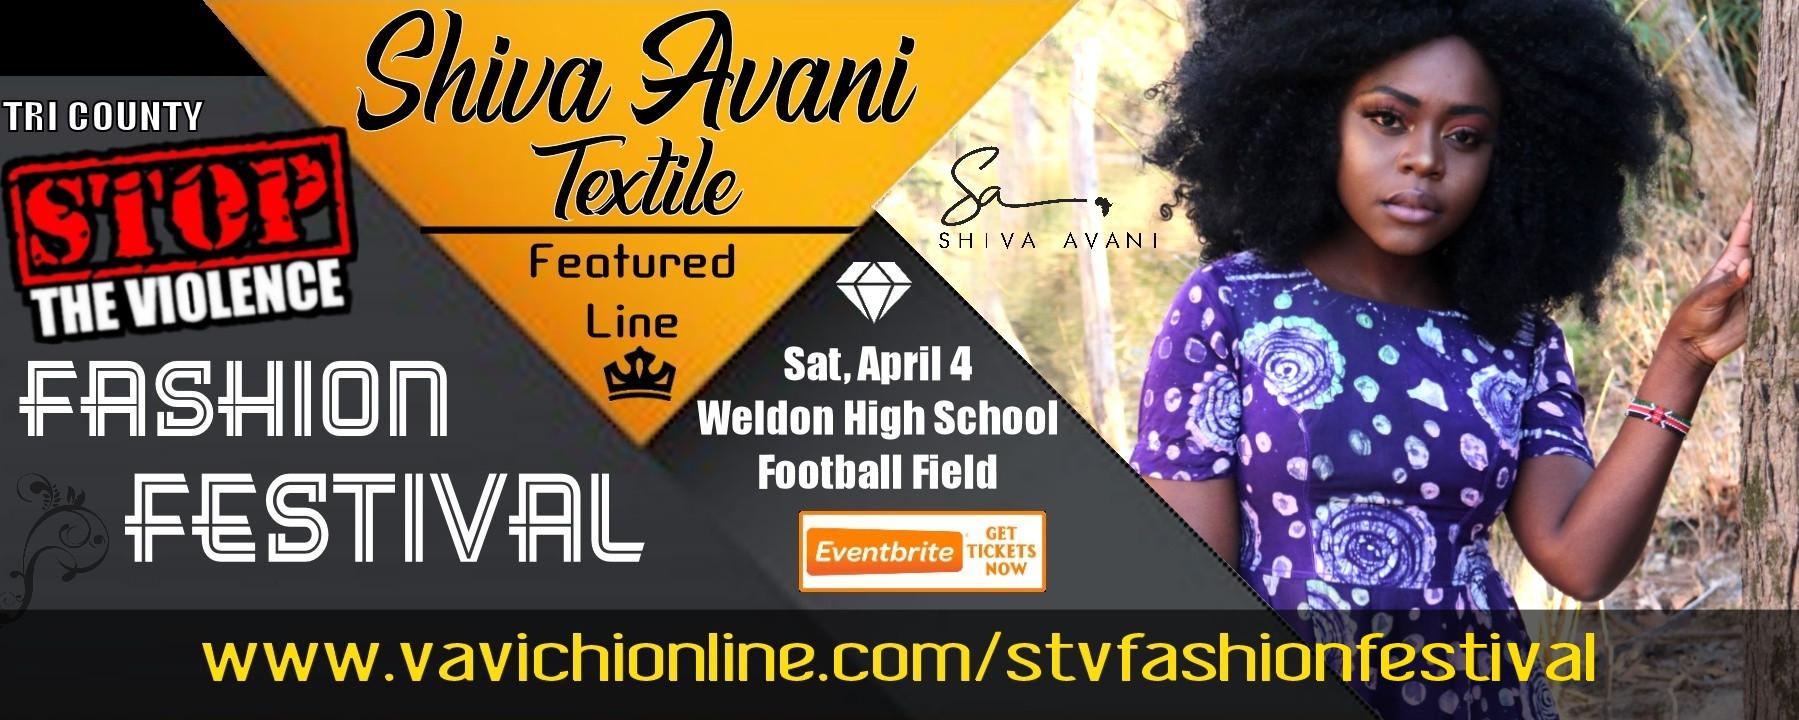 Shiva Avani Textile